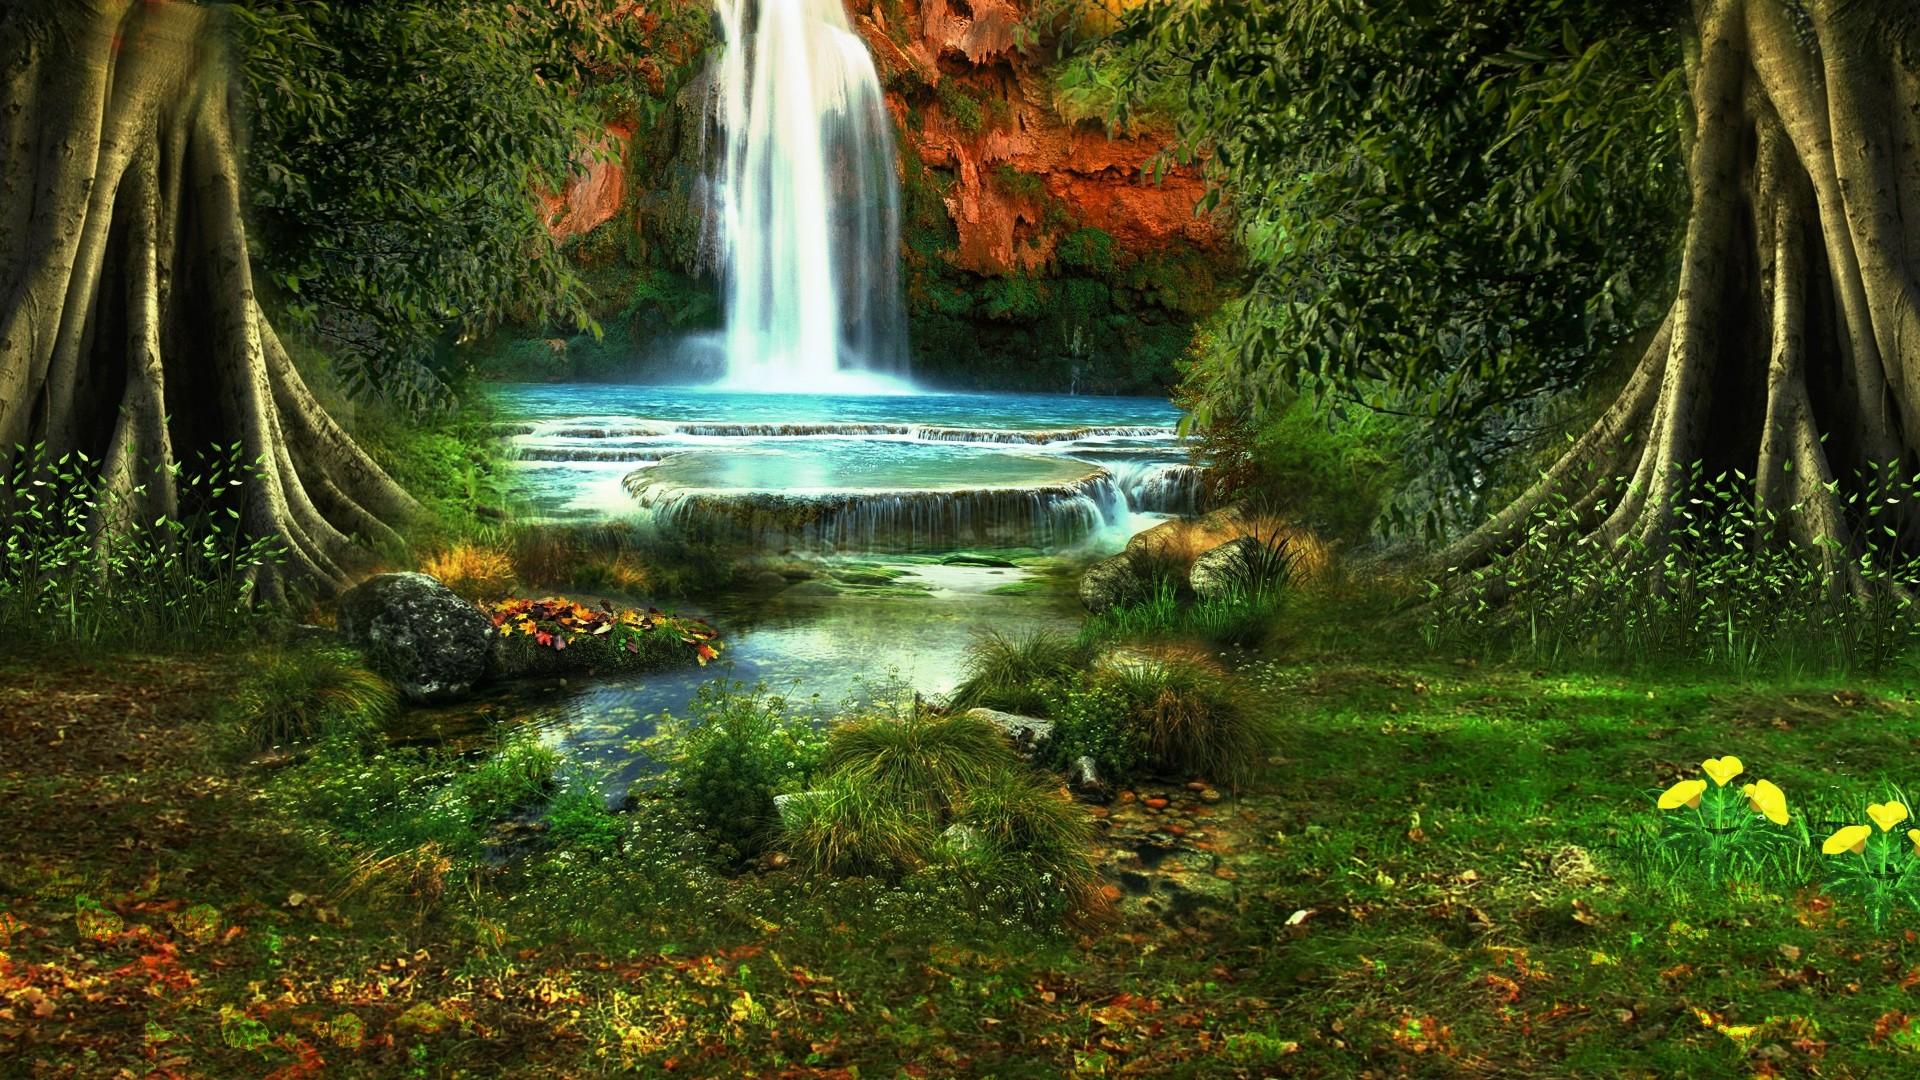 Download Wallpaper waterfall, trees, vegetation, nature, landscape  Full HD 1080p HD Background